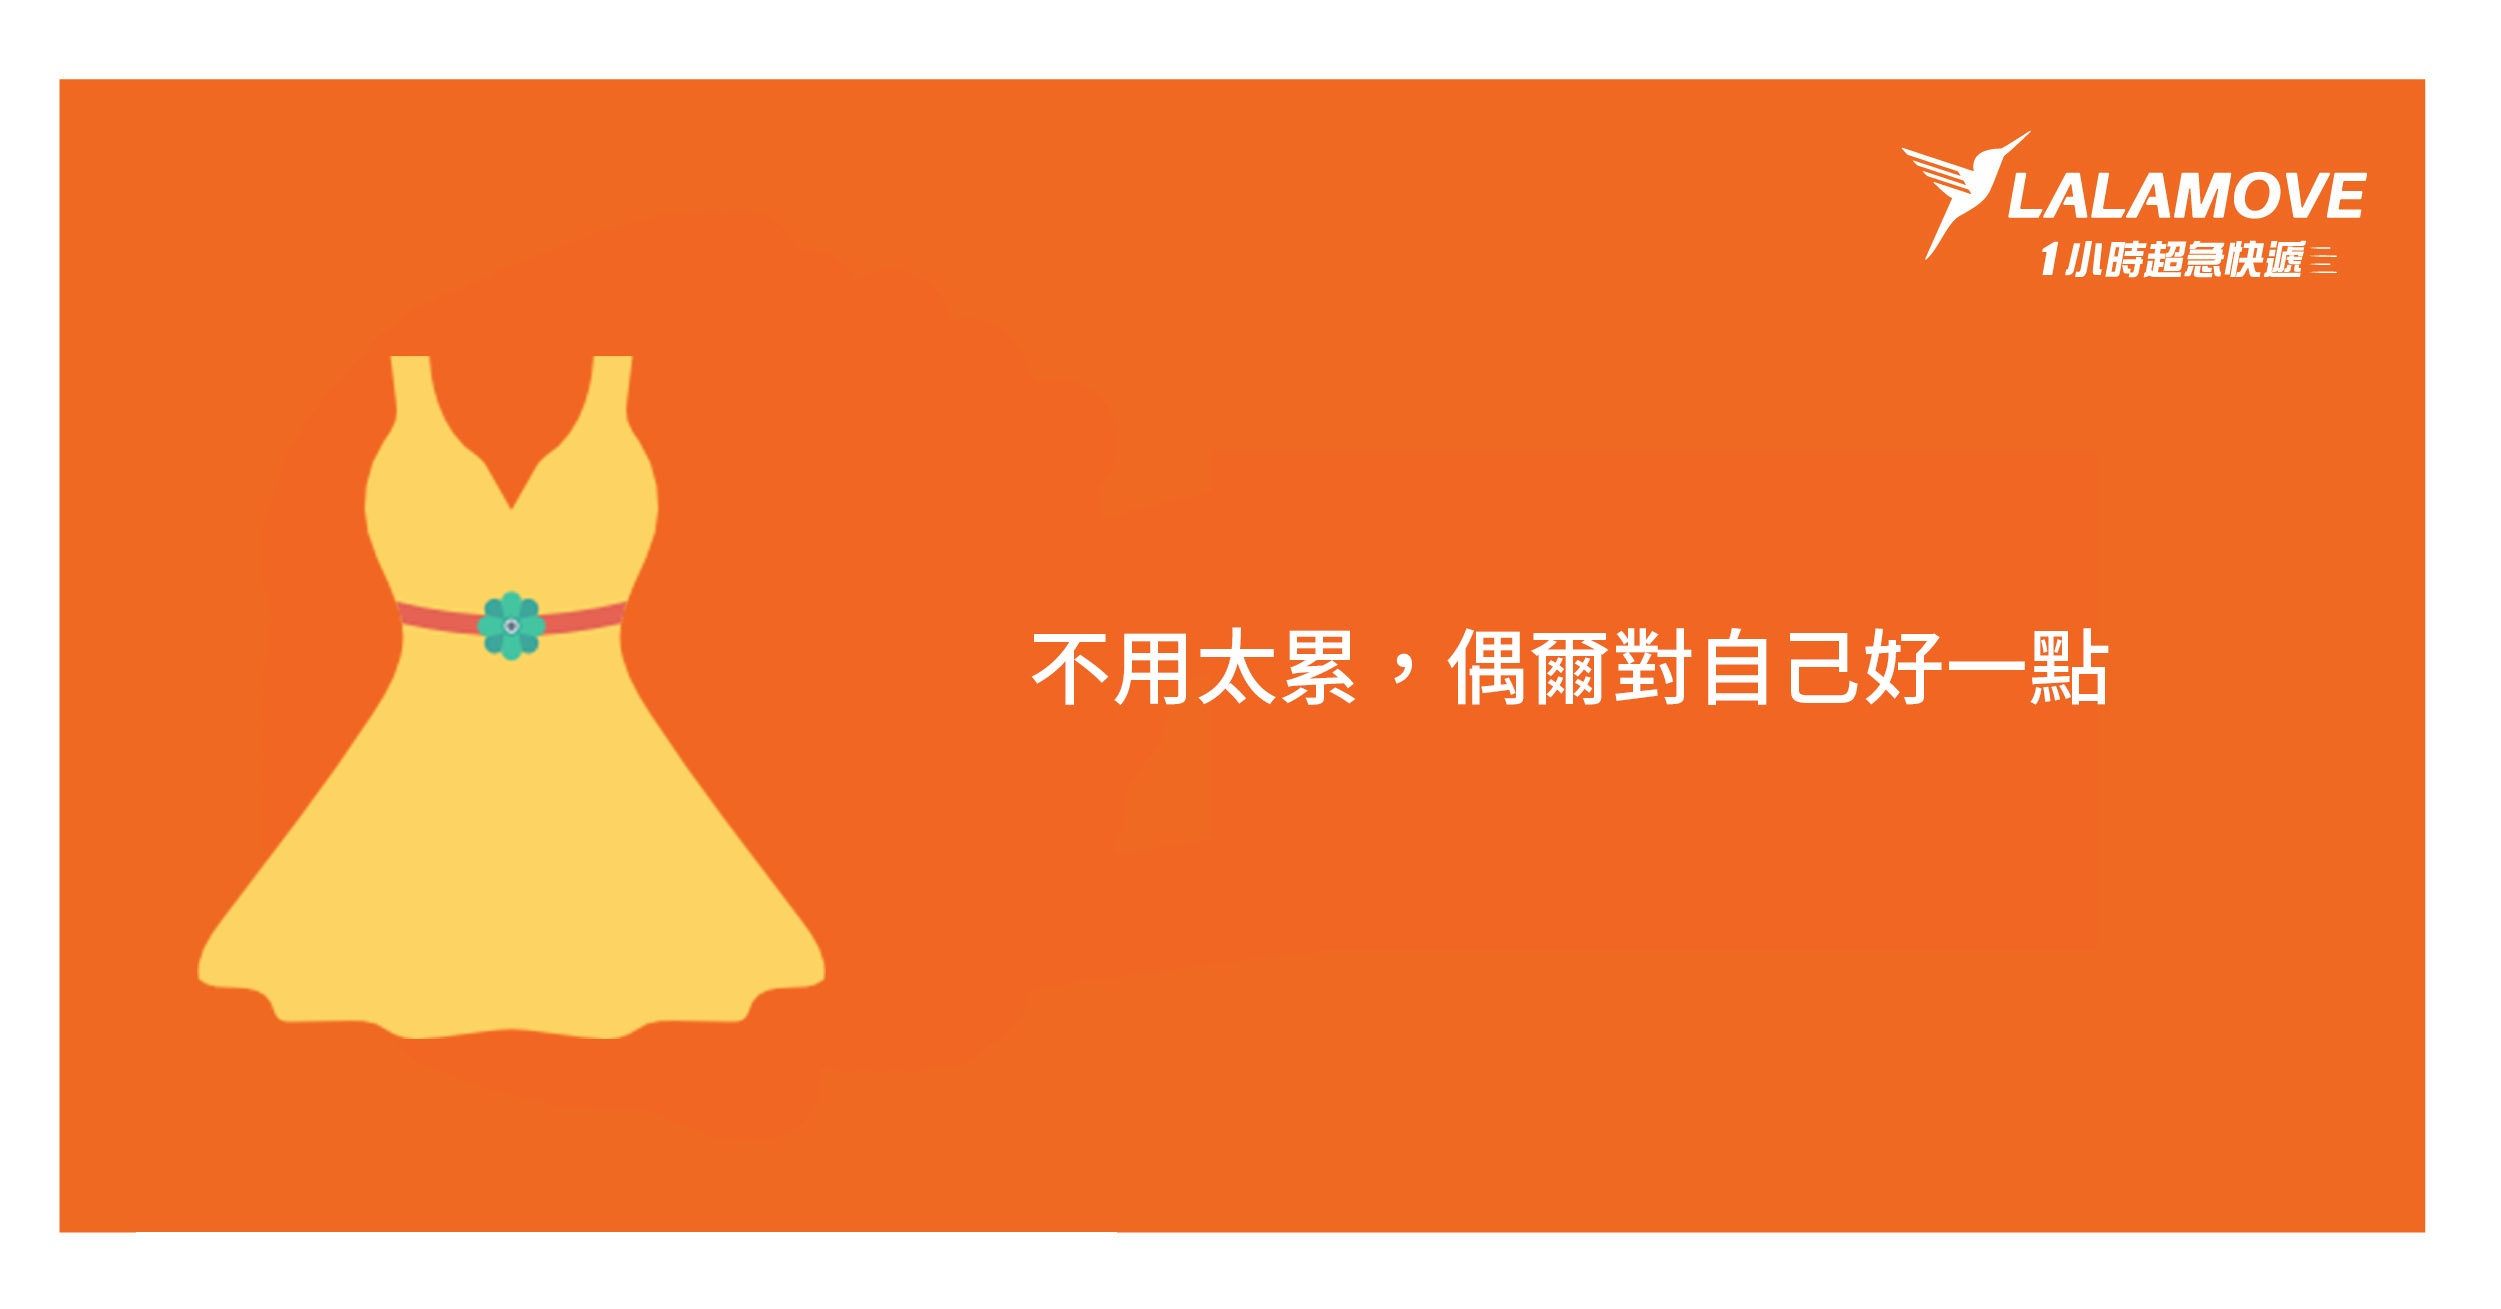 tw_20171222_取衣服4.jpg